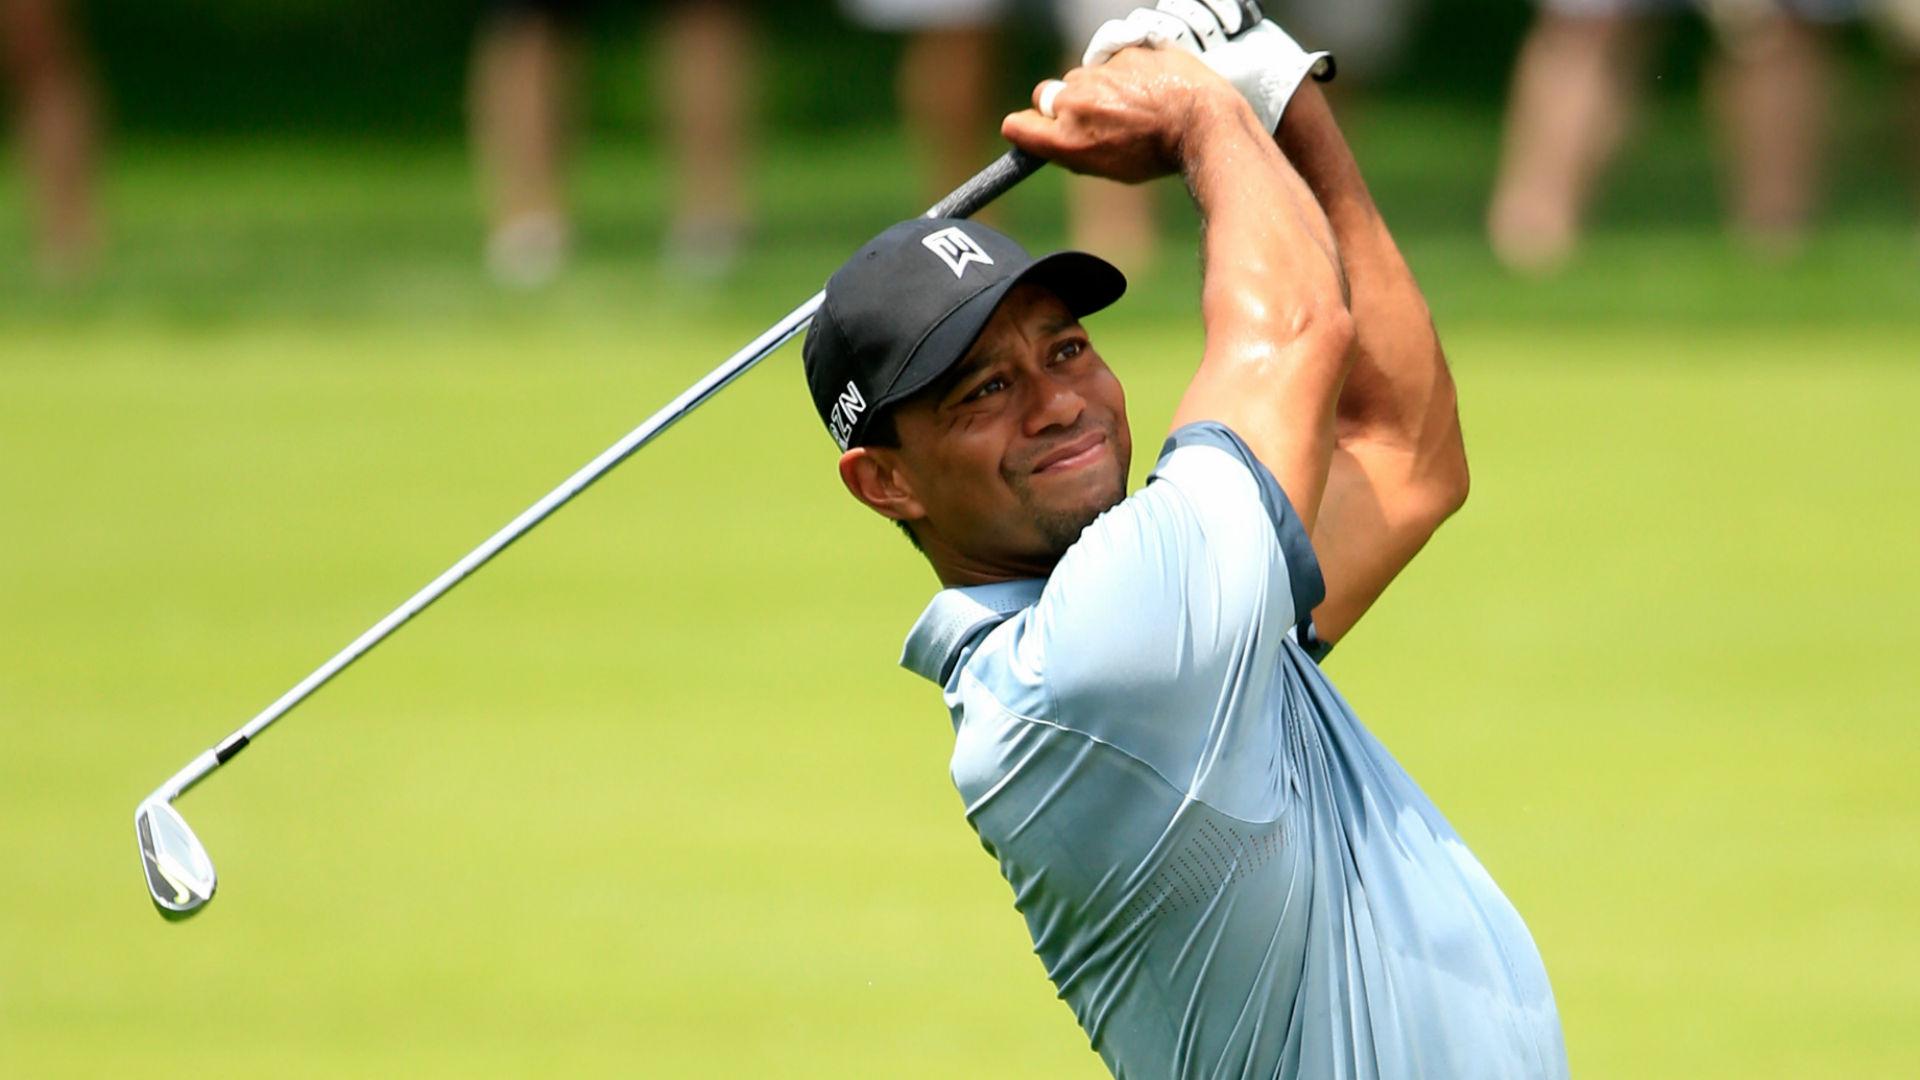 Woods-Tiger-060515-USNews-Getty-FTR